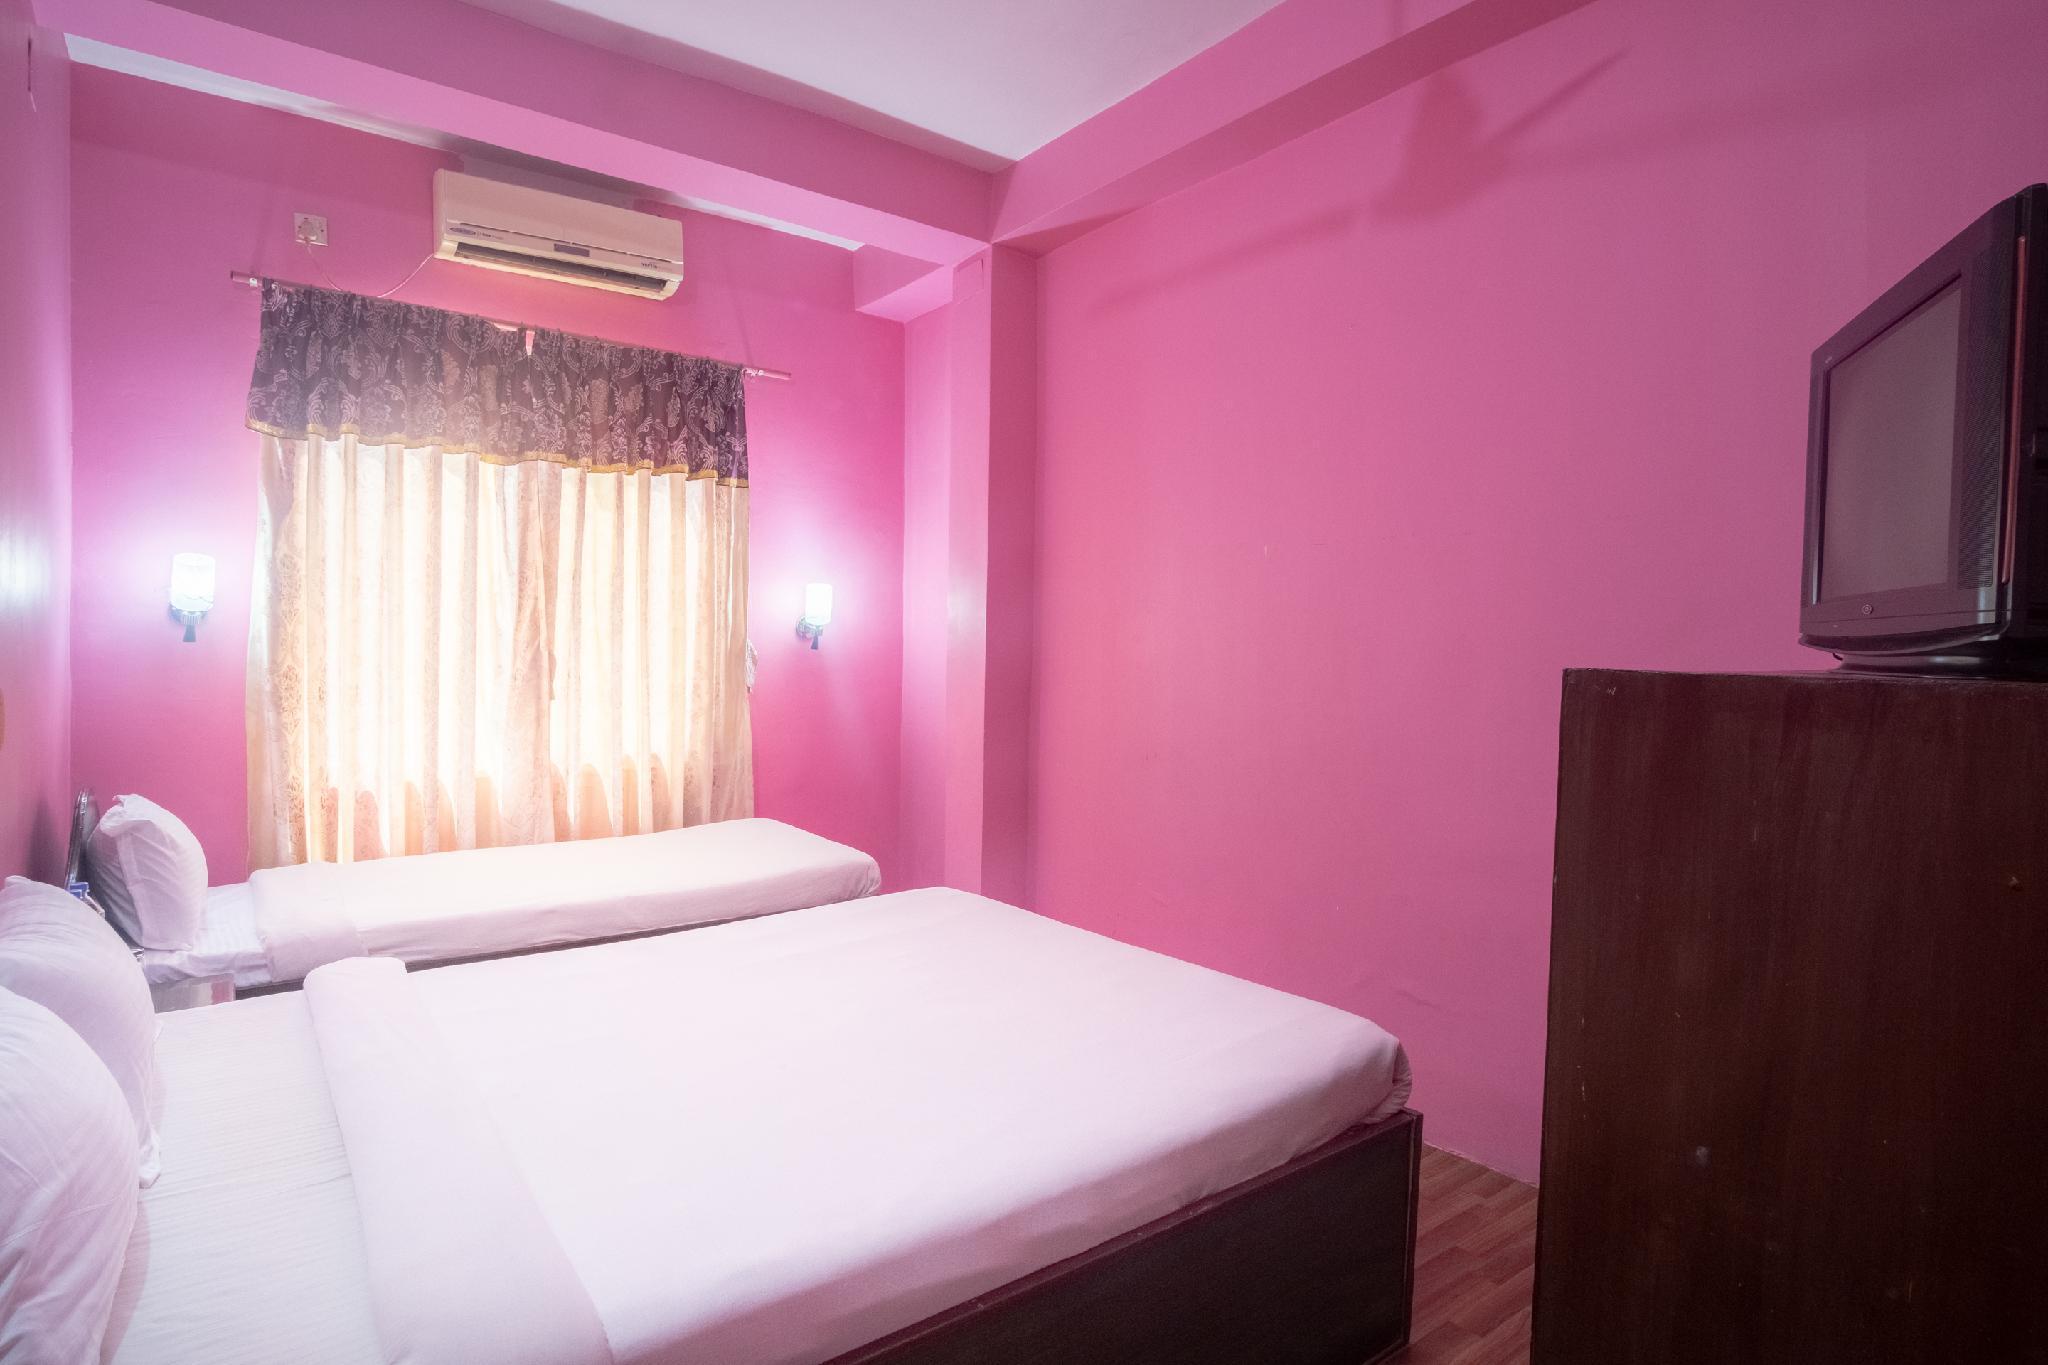 SPOT ON 550 Hotel Gangotri Highway Pvt. Ltd.